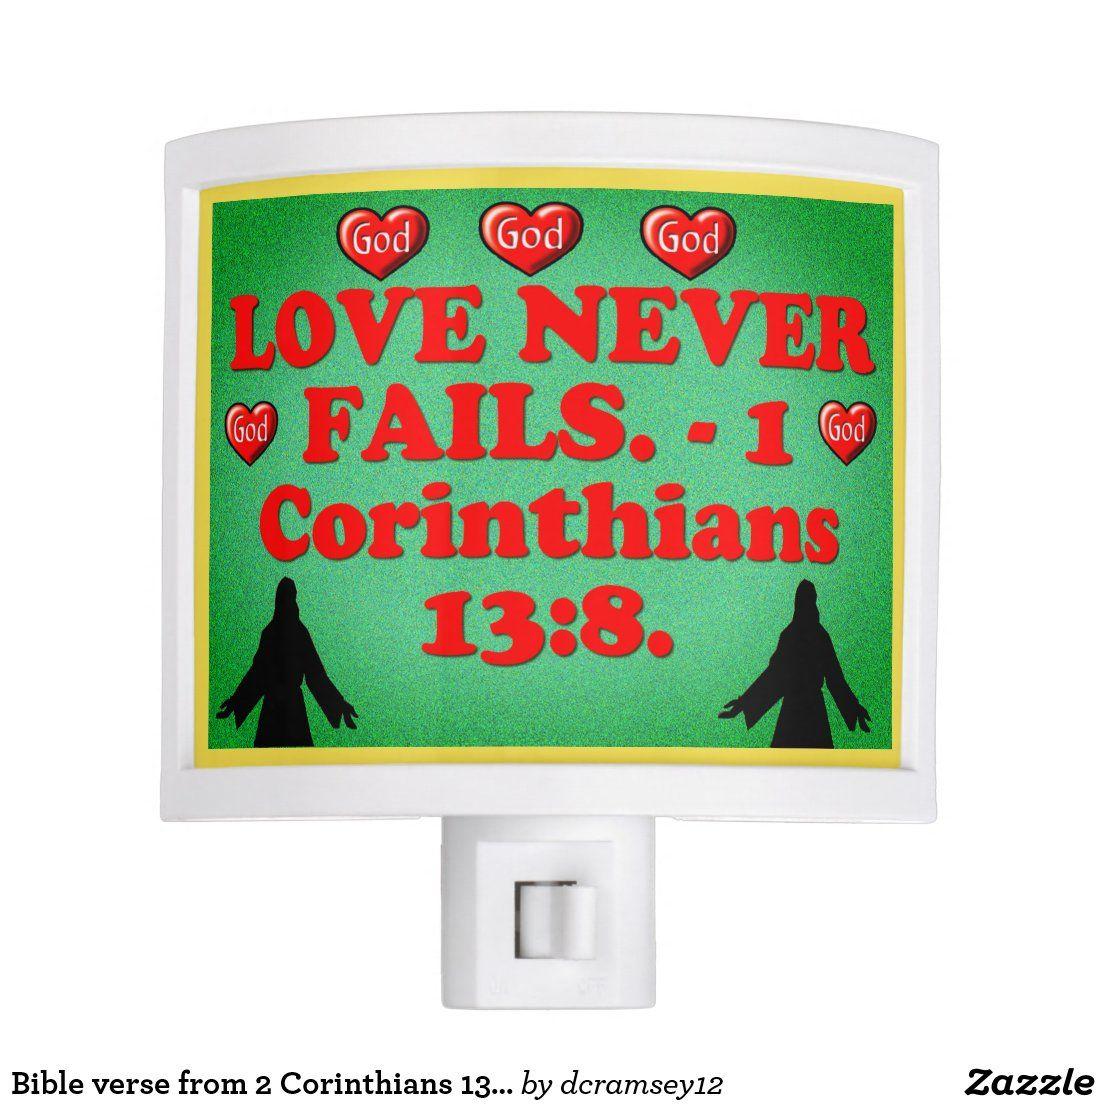 LOVE NEVER FAILS. - 1 Corinthians 13:8. Night Light.